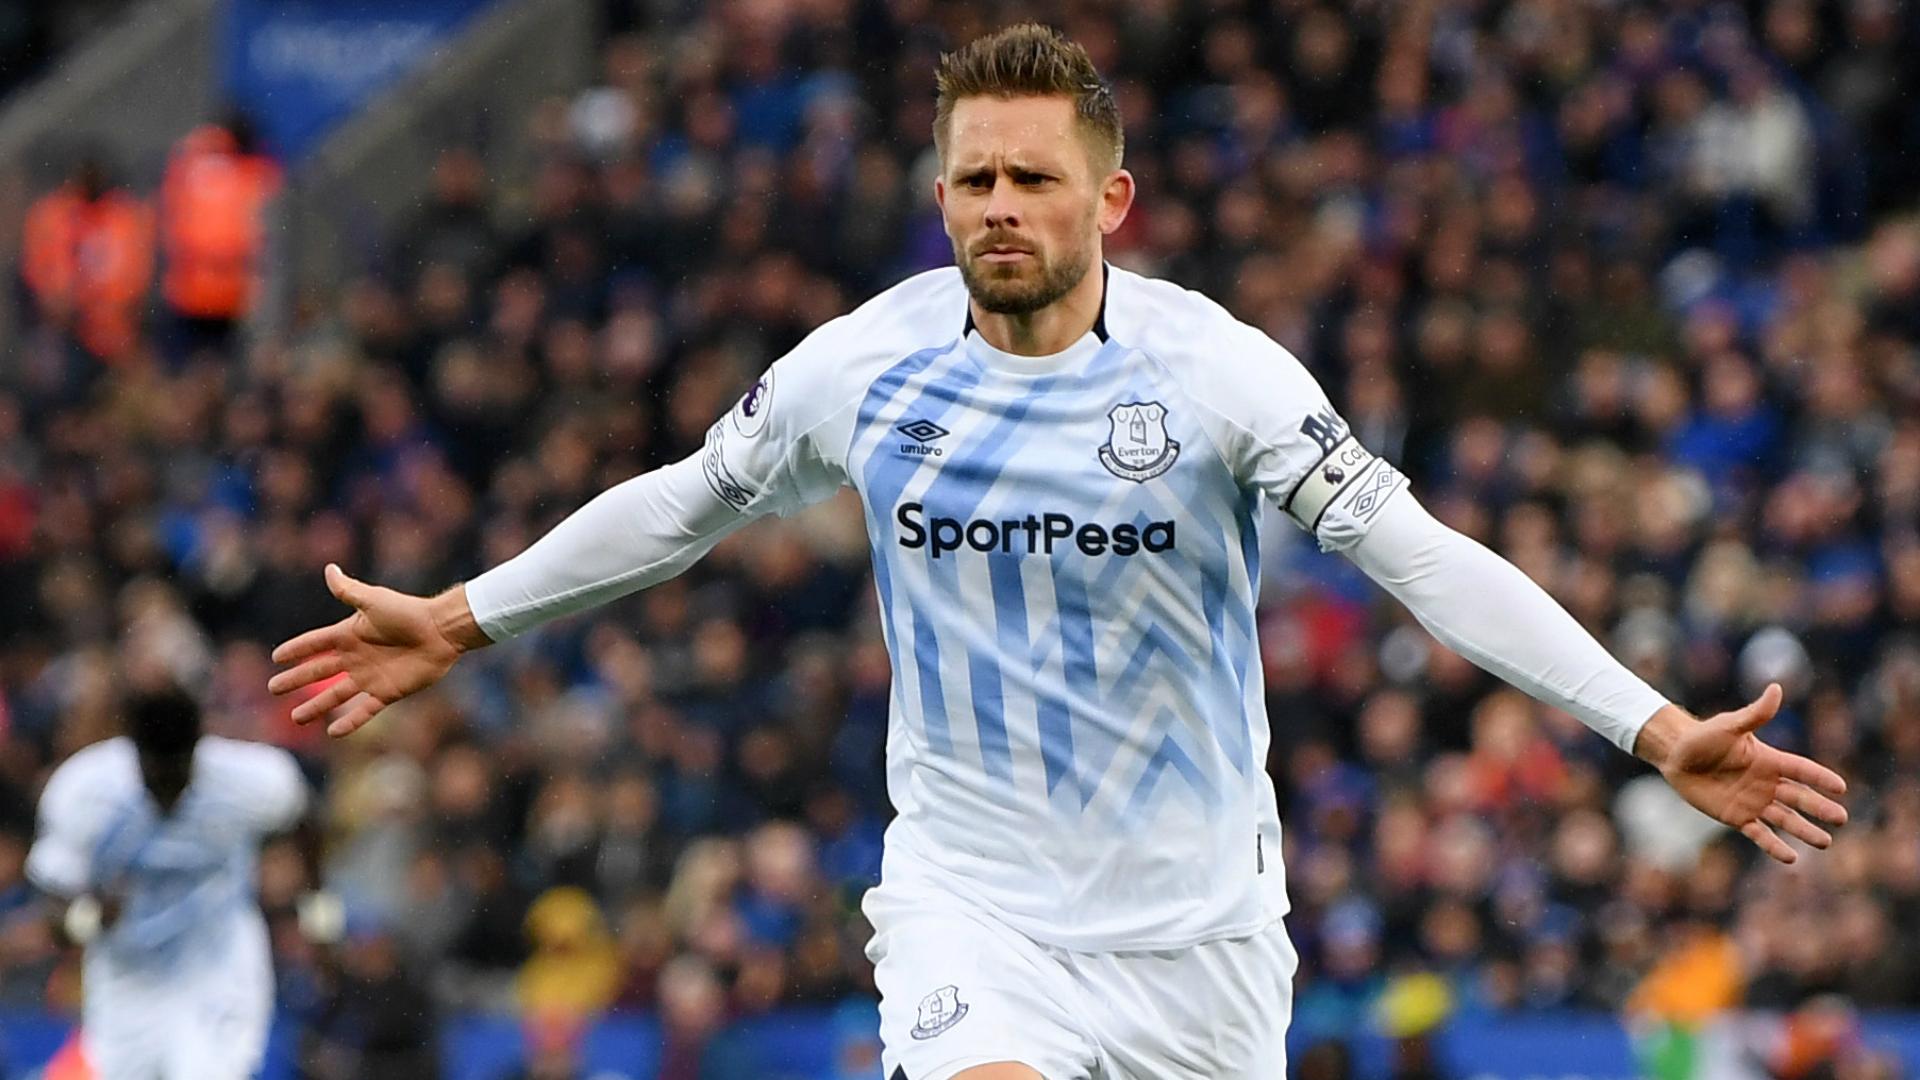 Leicester City vs. Everton - Football Match Report